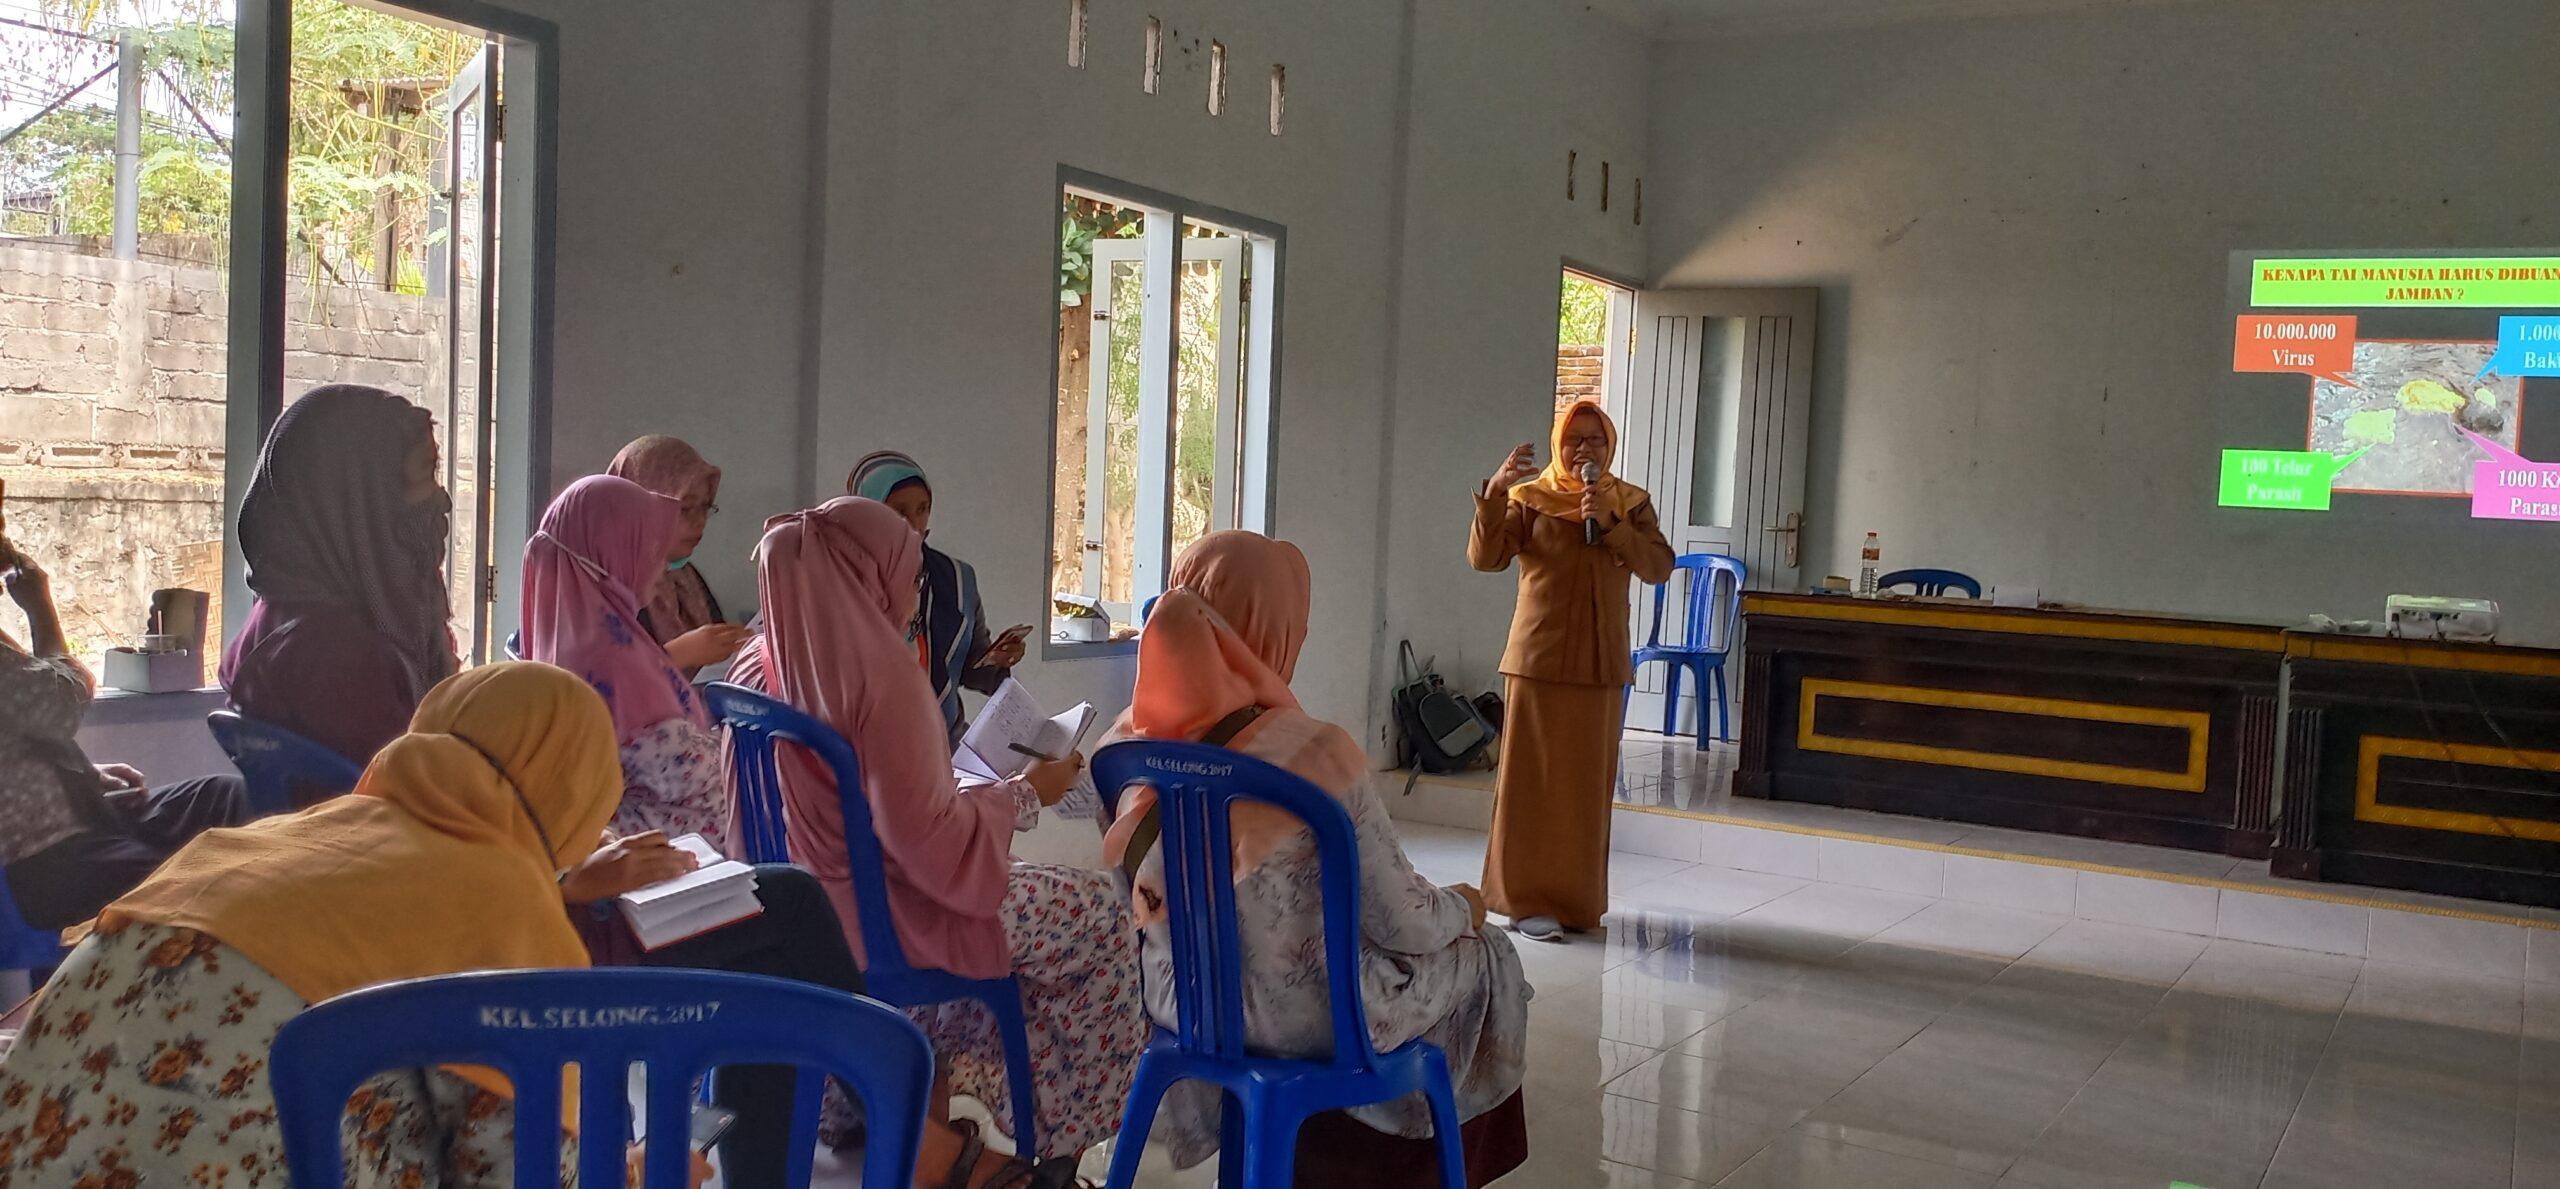 bab sembarangan, Target off di lombok timur, mitra Samya, unicef program odf